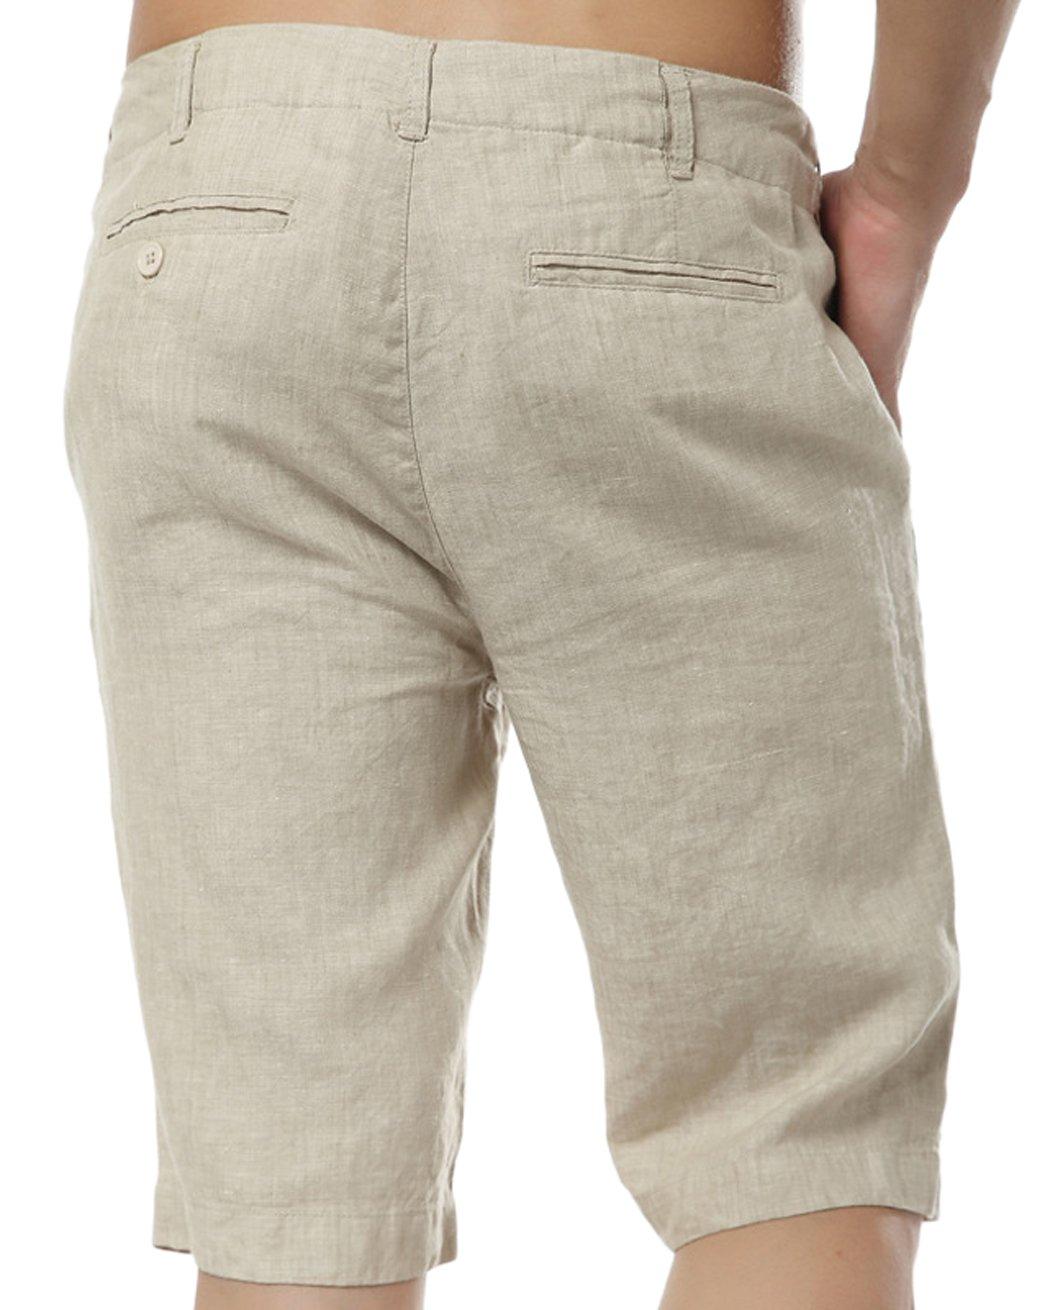 utcoco Men's Summer Straight Fit Flat-Front Linen Shorts (Medium, Khaki) by utcoco (Image #2)